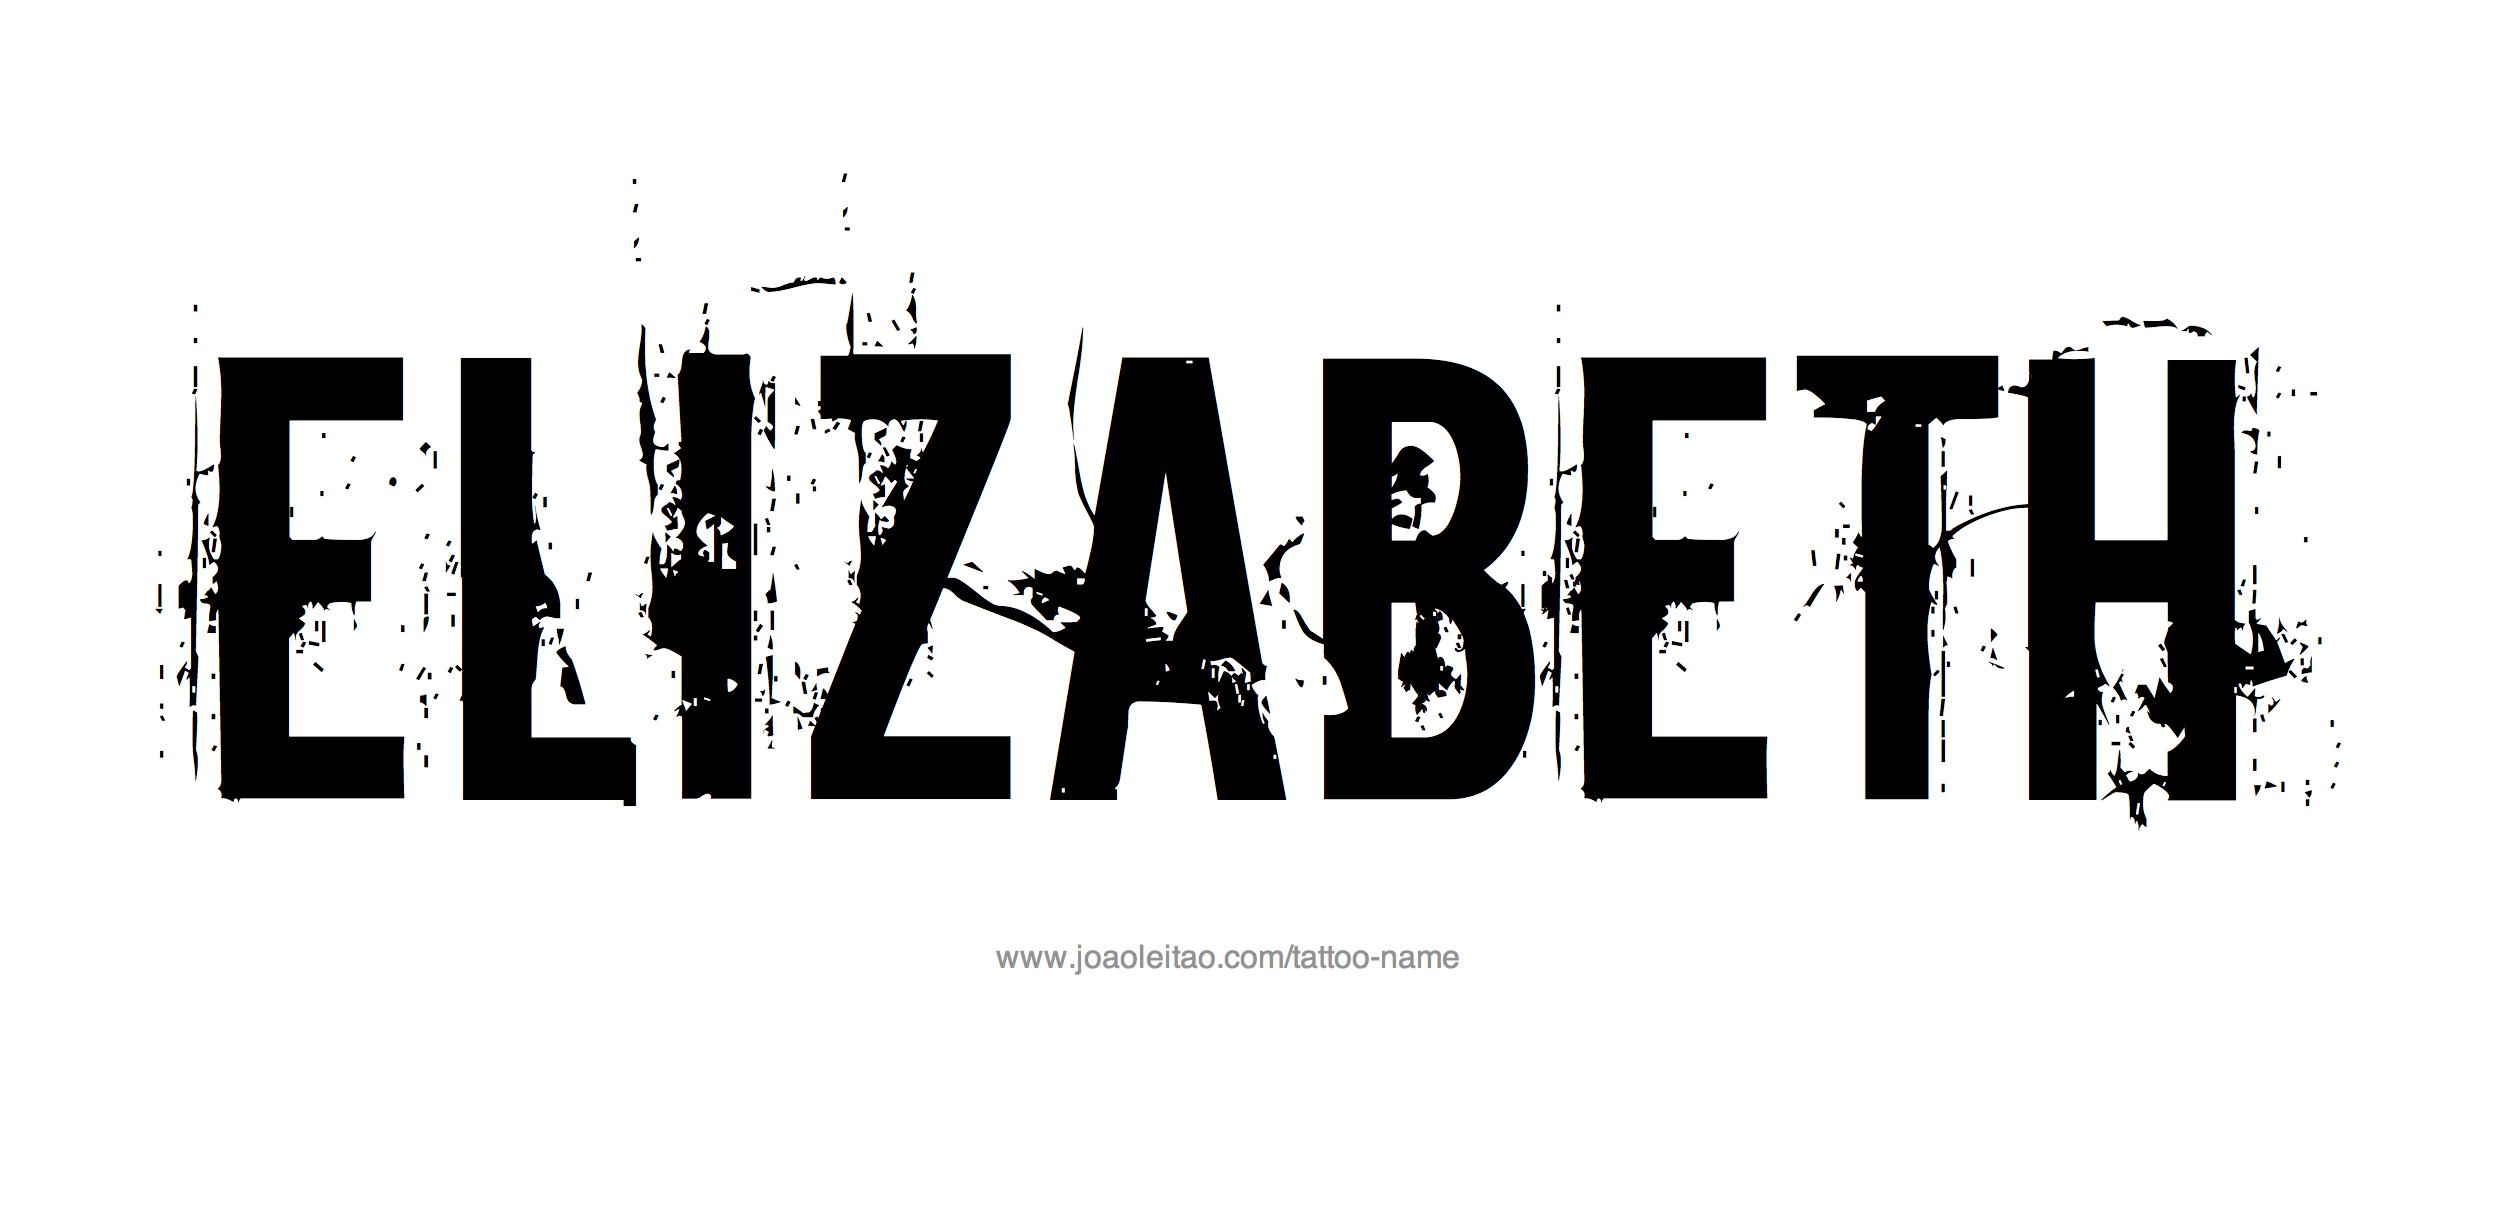 Tattoo Design Name Elizabeth